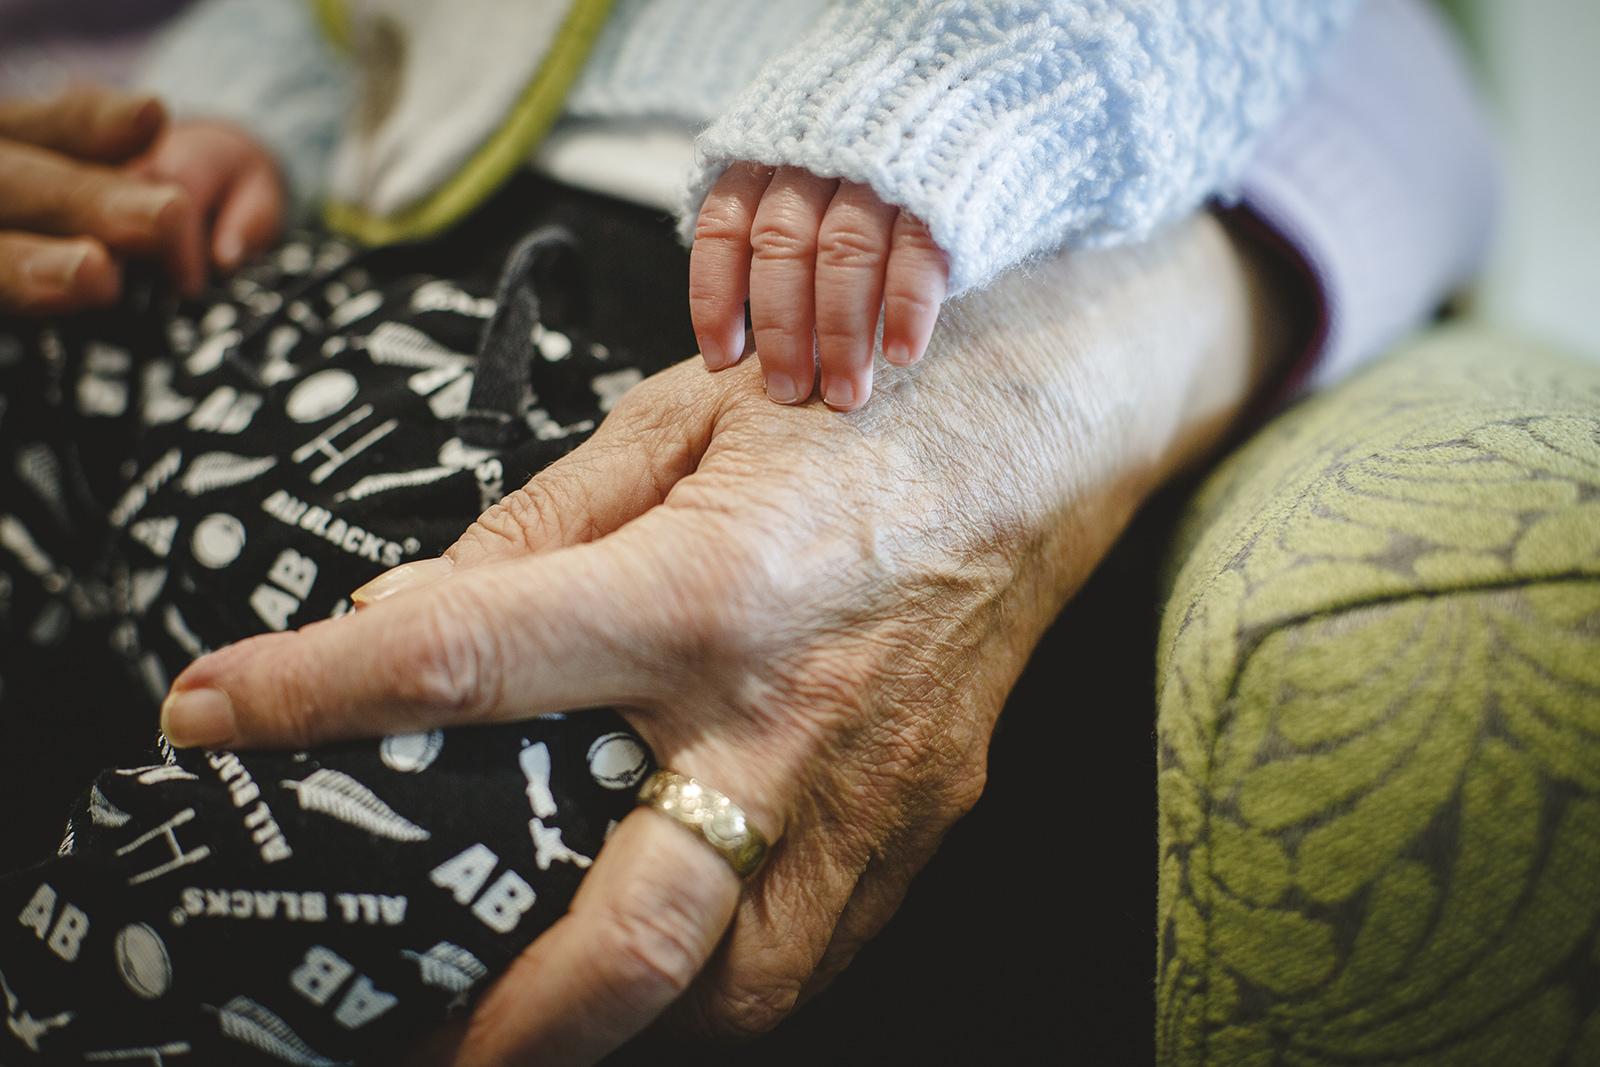 Act-of-Kindness-Elderly-Rest-Home-Visits-19.jpg